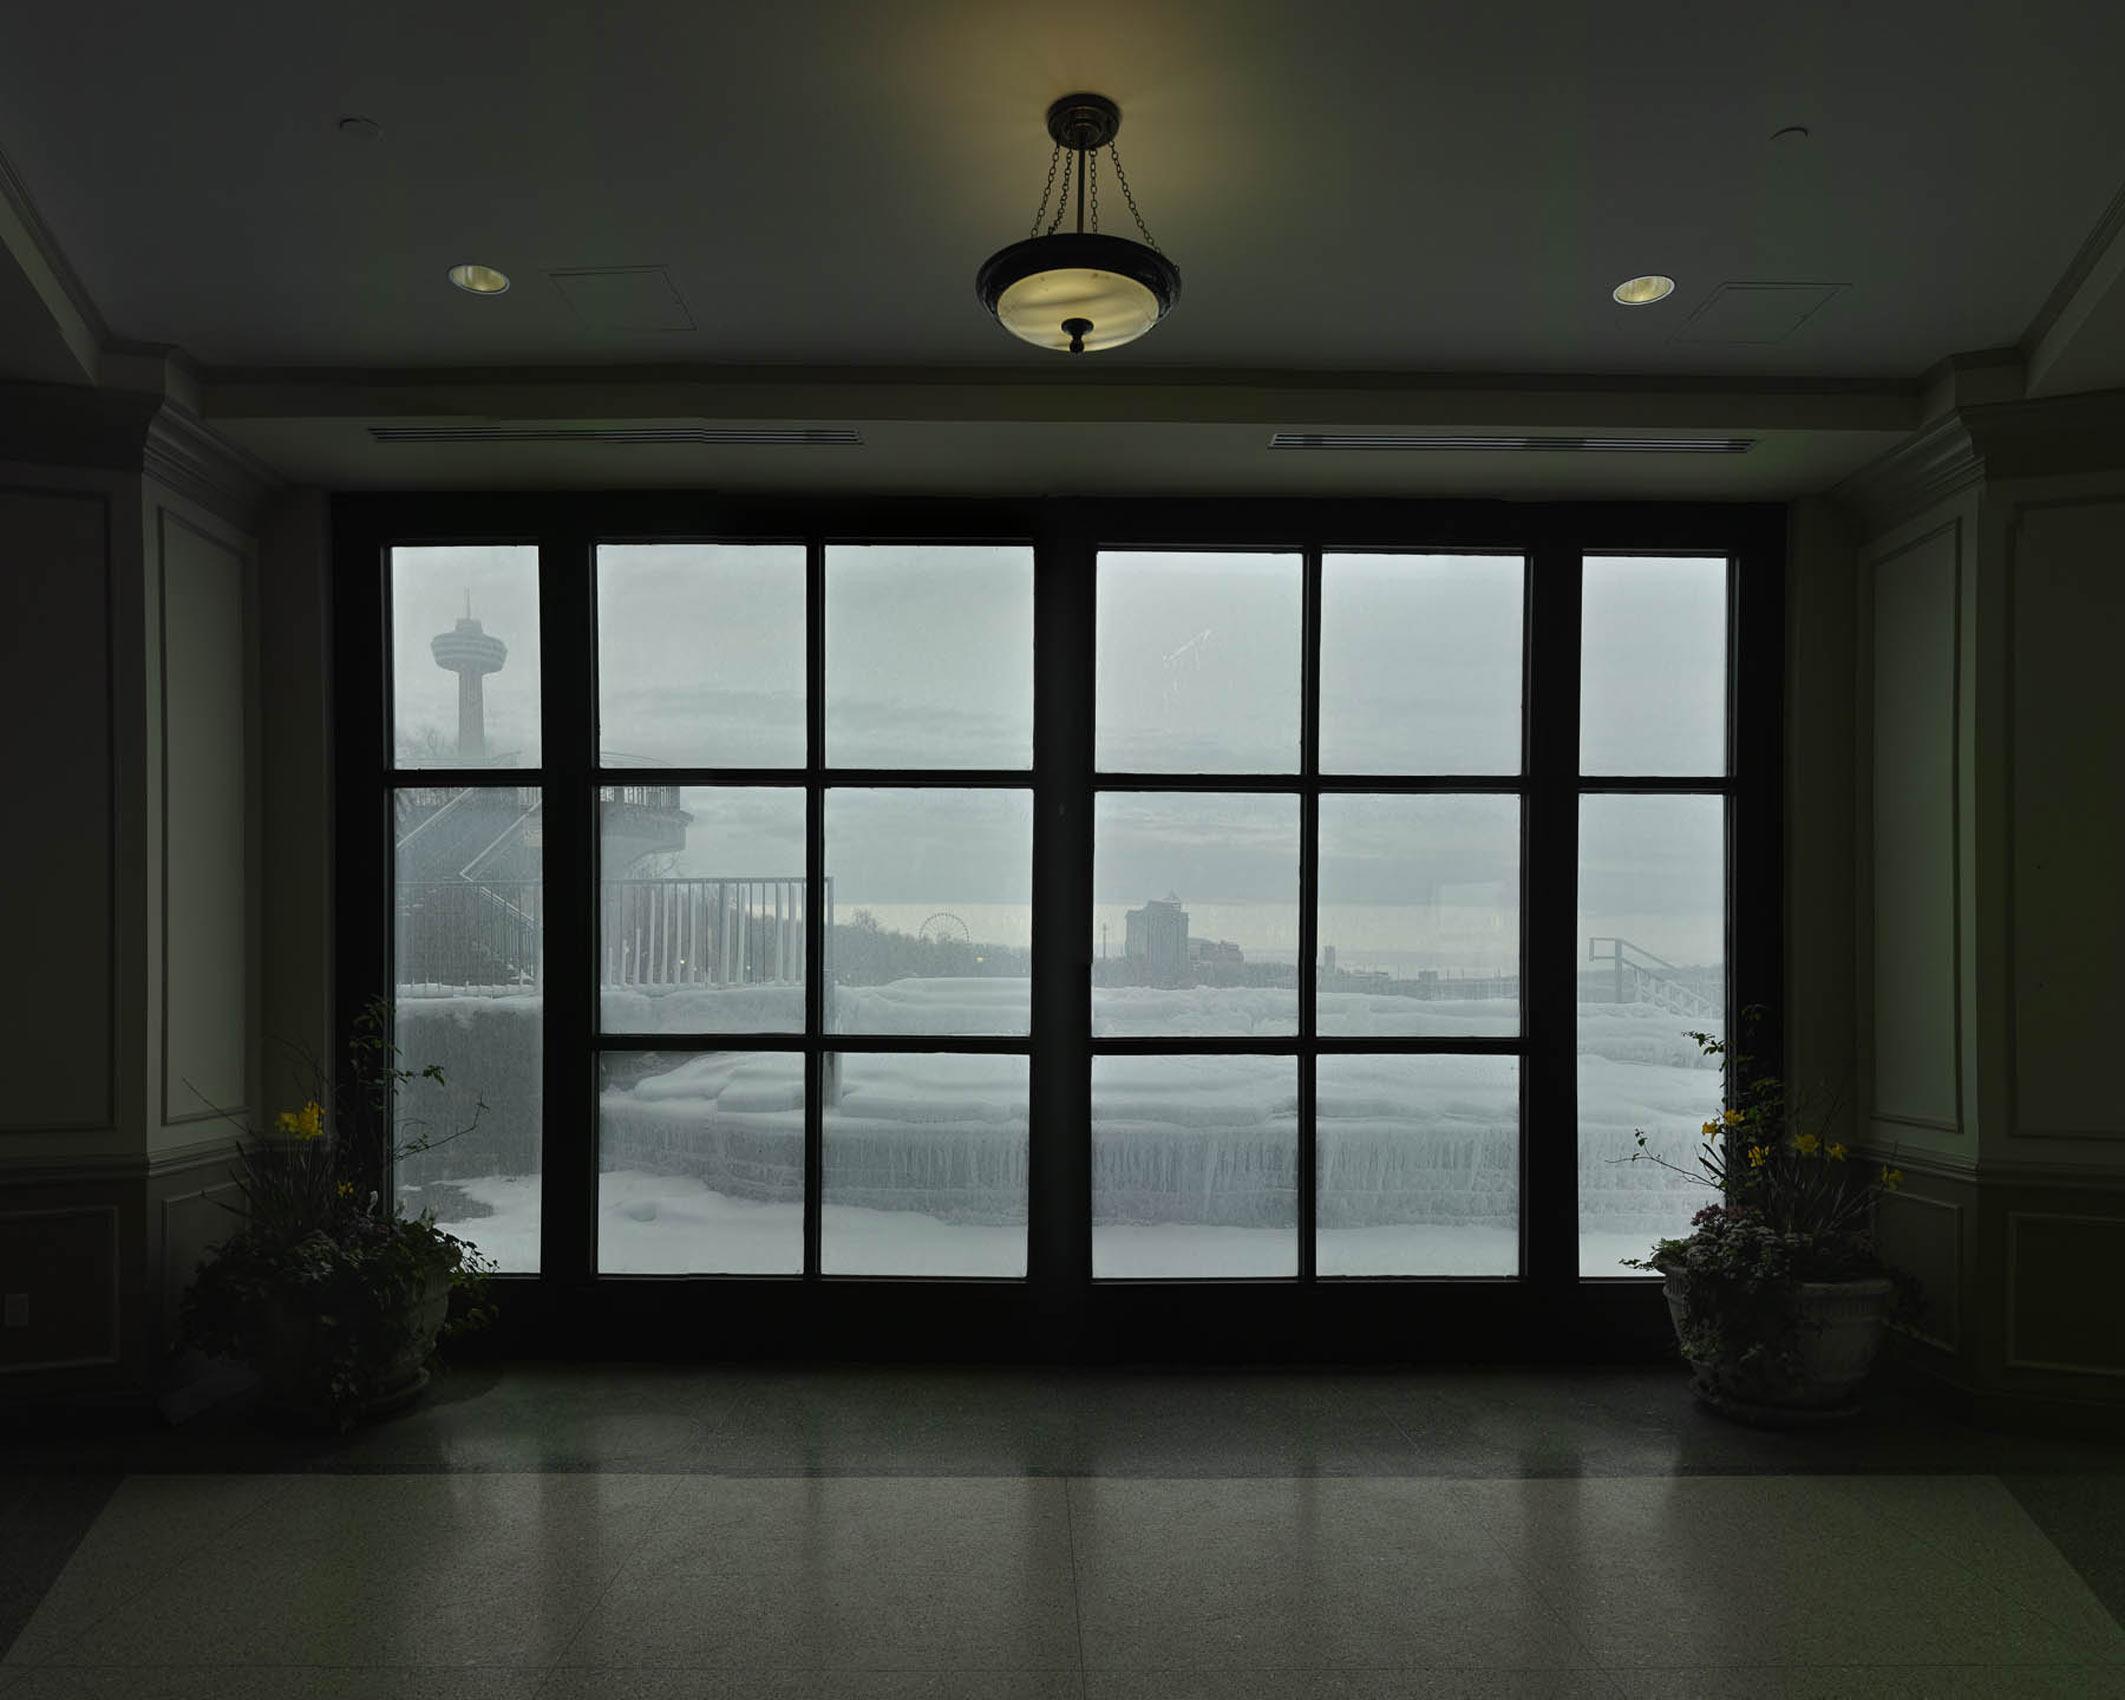 02_david_picchiottino_window_windows_fenetre-22.jpg